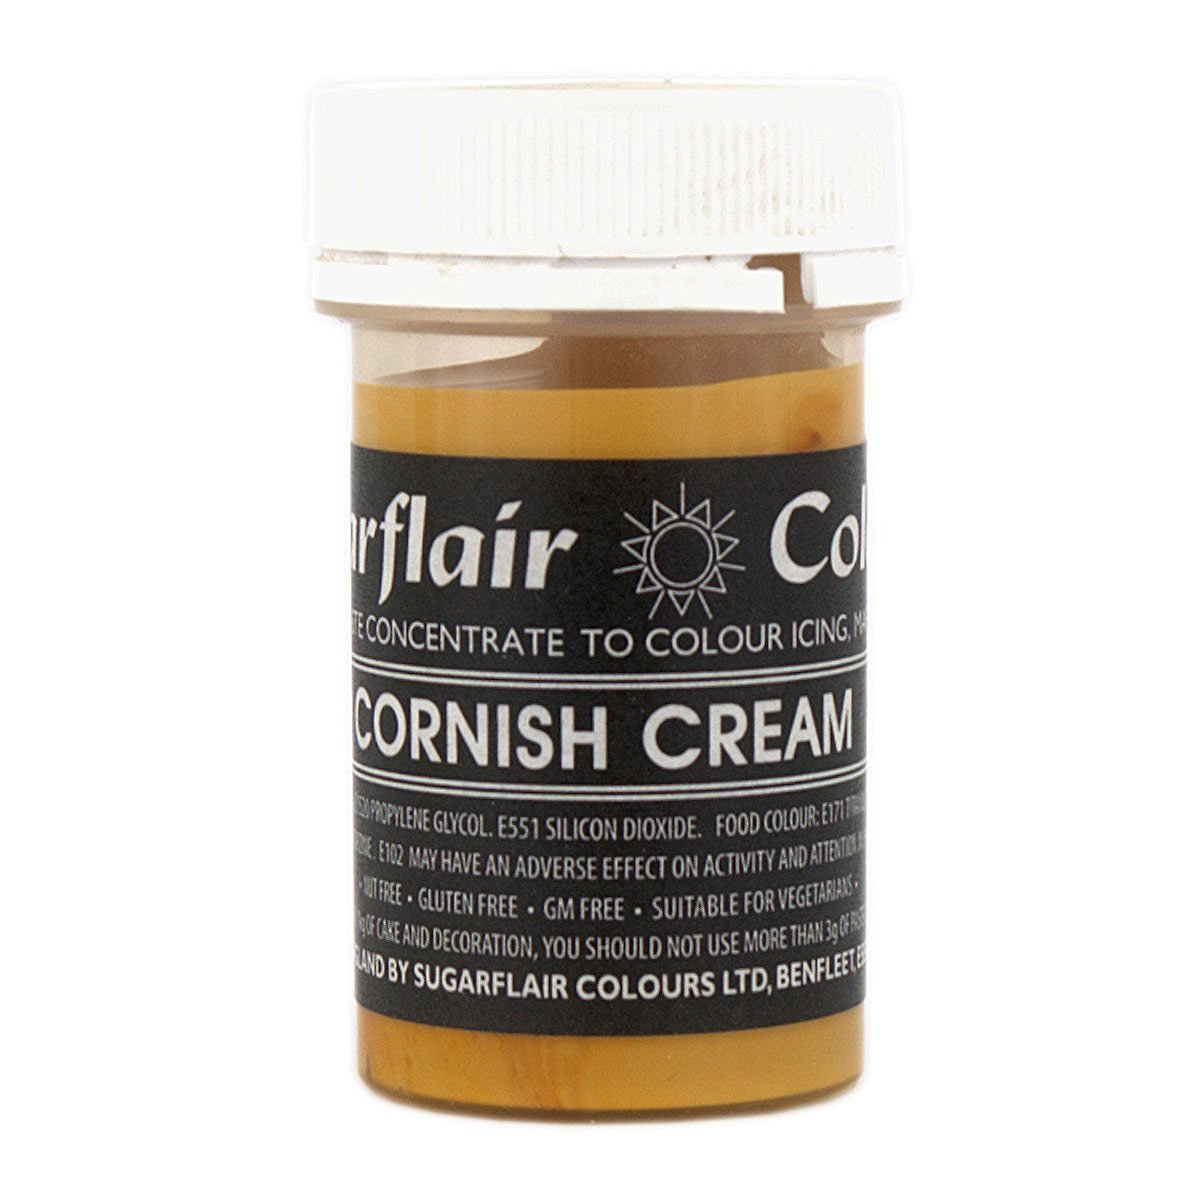 30 x Sugarflair CORNISH CREAM Pastel Edible Food Colour Paste for Cake Icing 25g